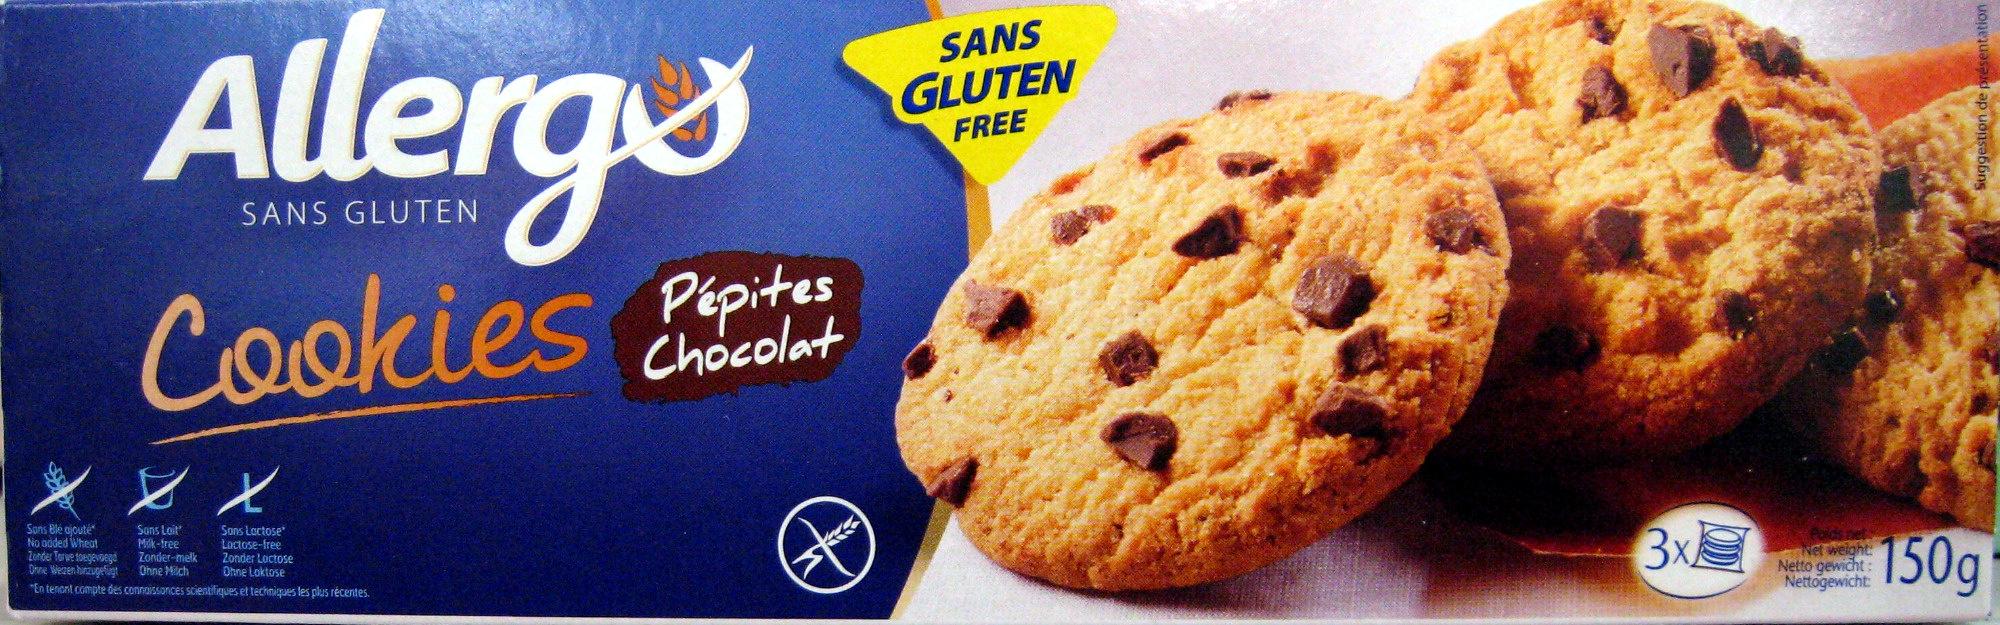 Cookies pépites chocolat sans gluten Allergo - Product